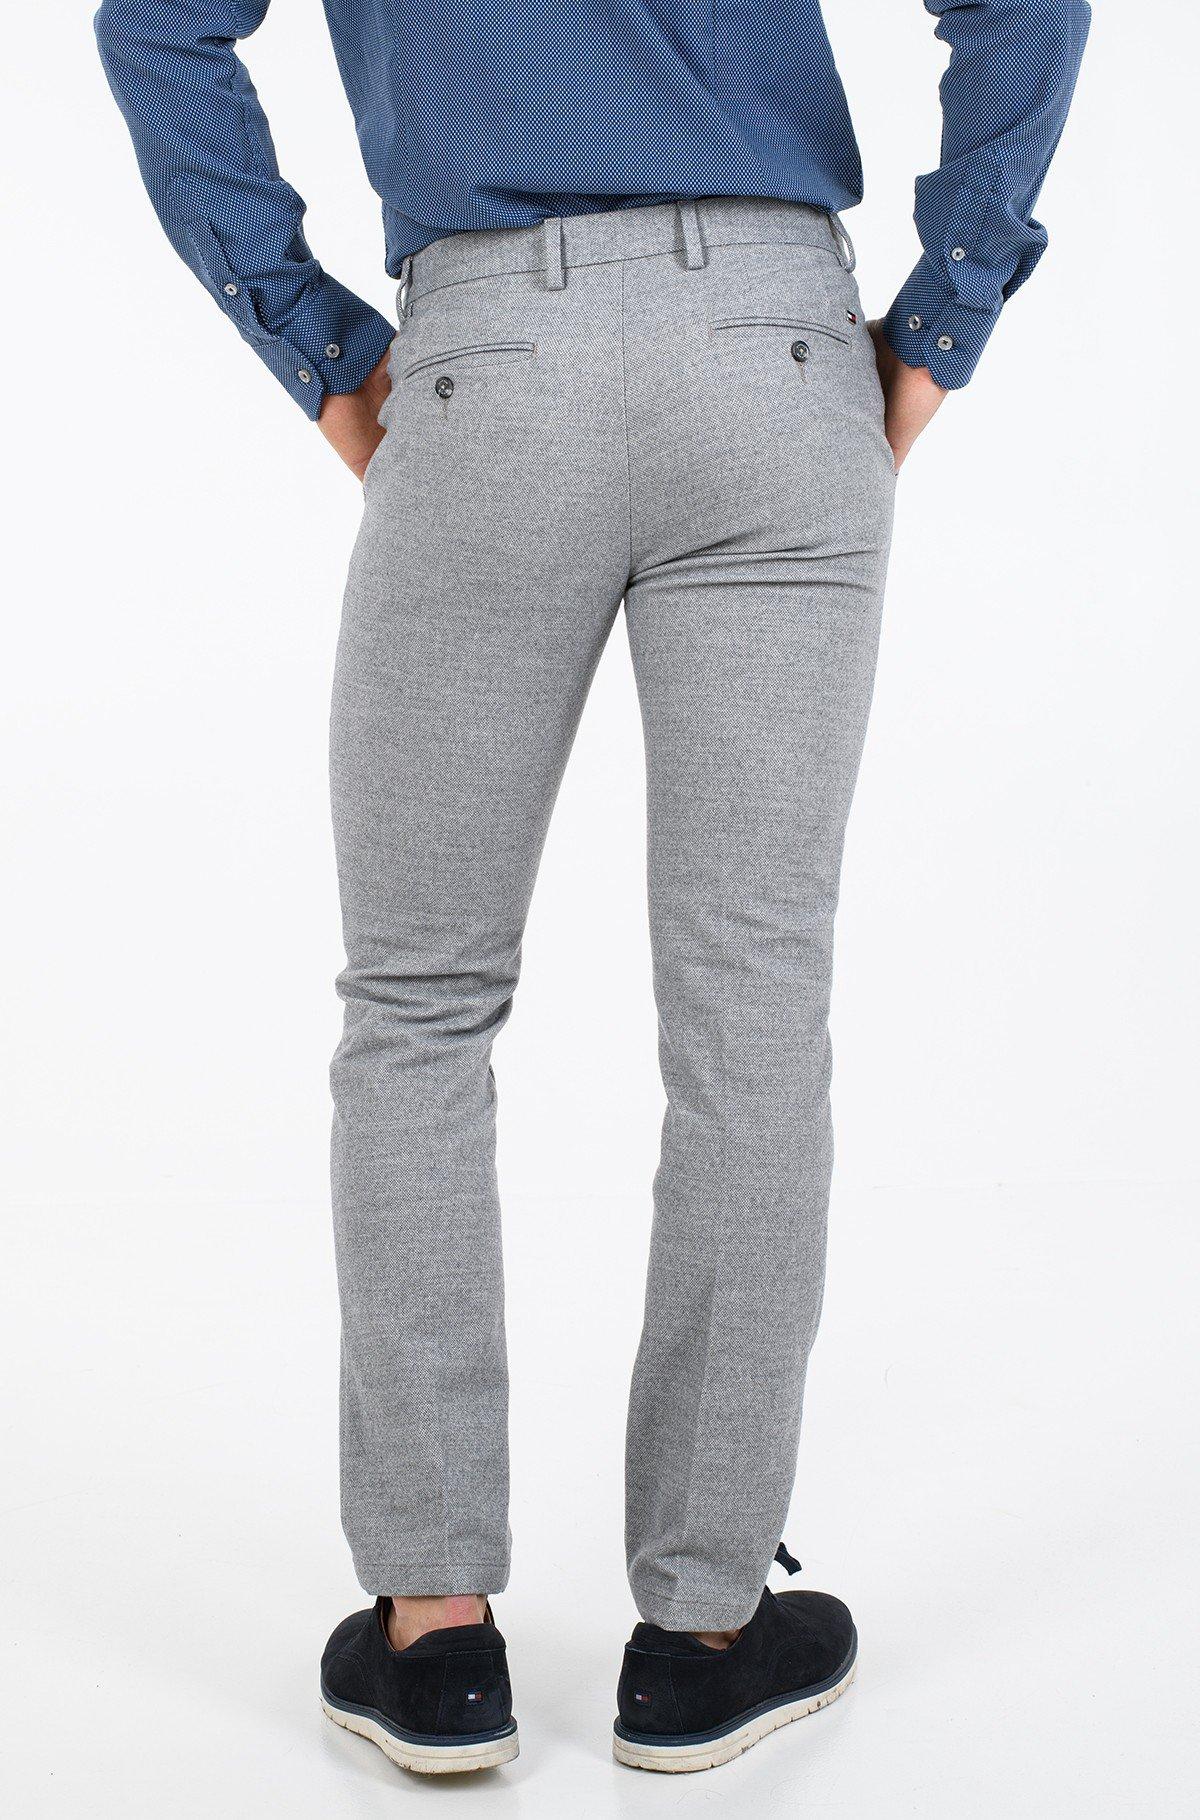 Kelnės su kantu DENTON CHINO WOOL LOOK FLEX-full-2